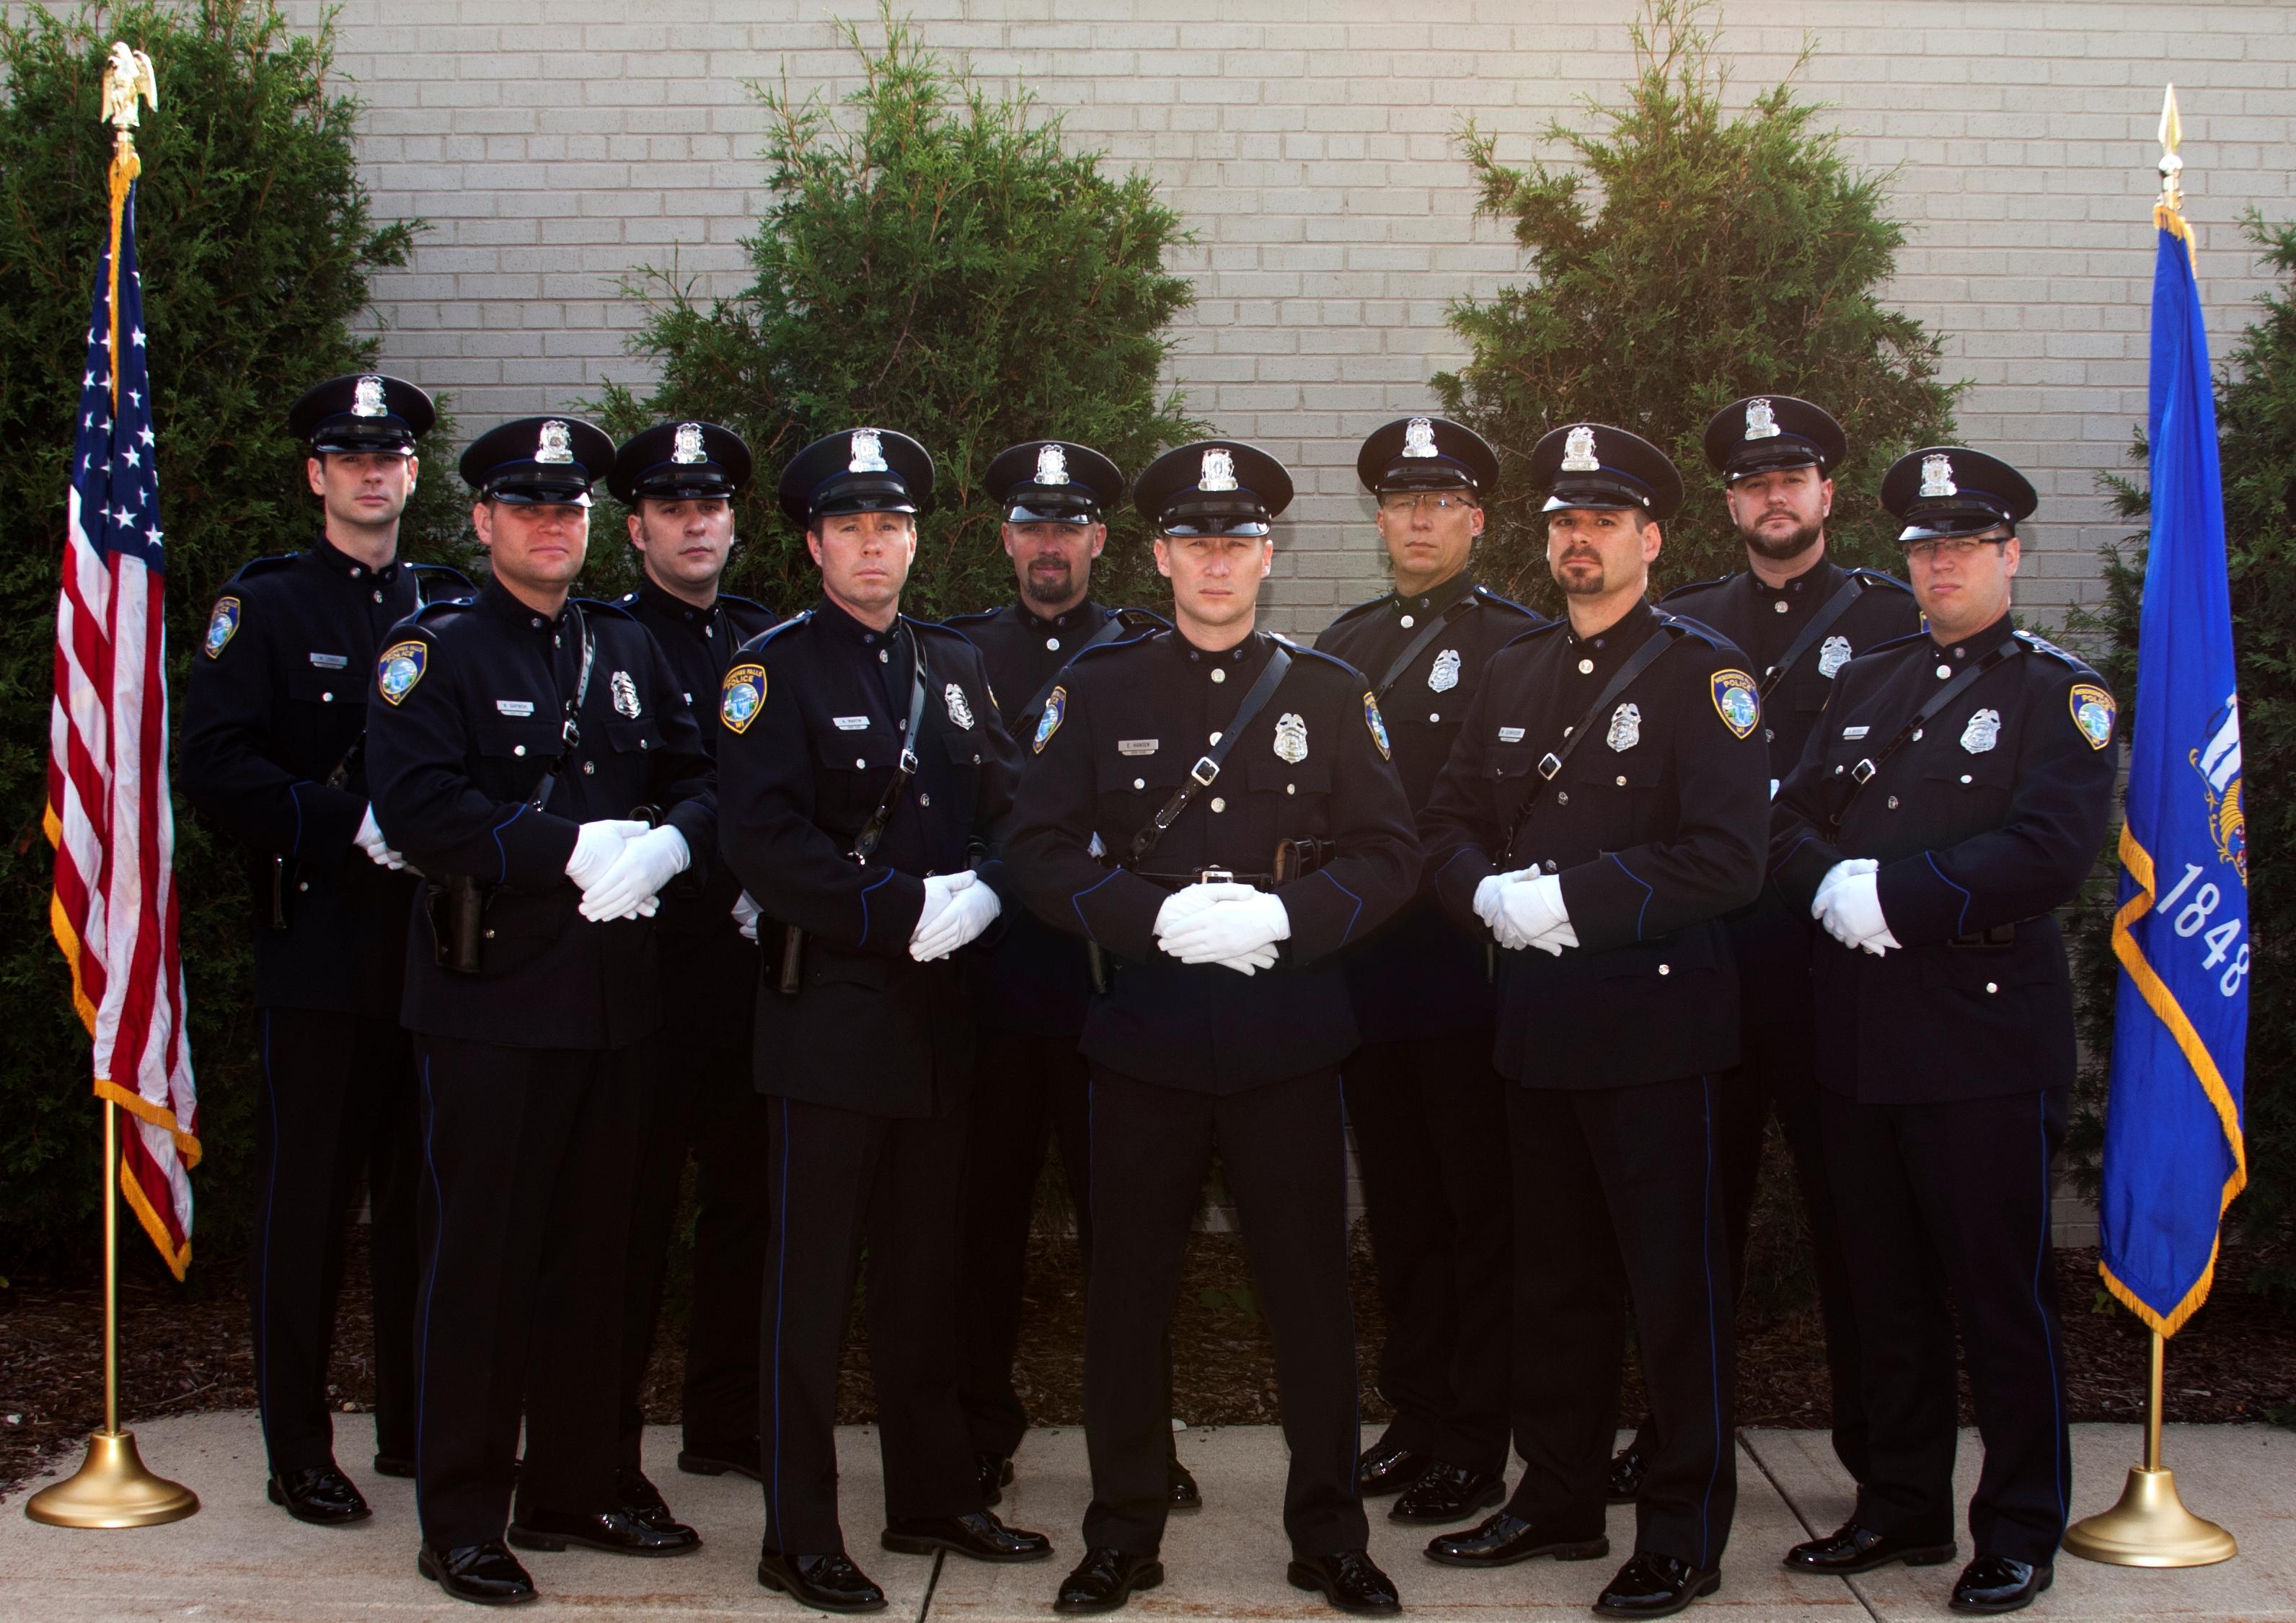 MFPD Honor Guard Unit